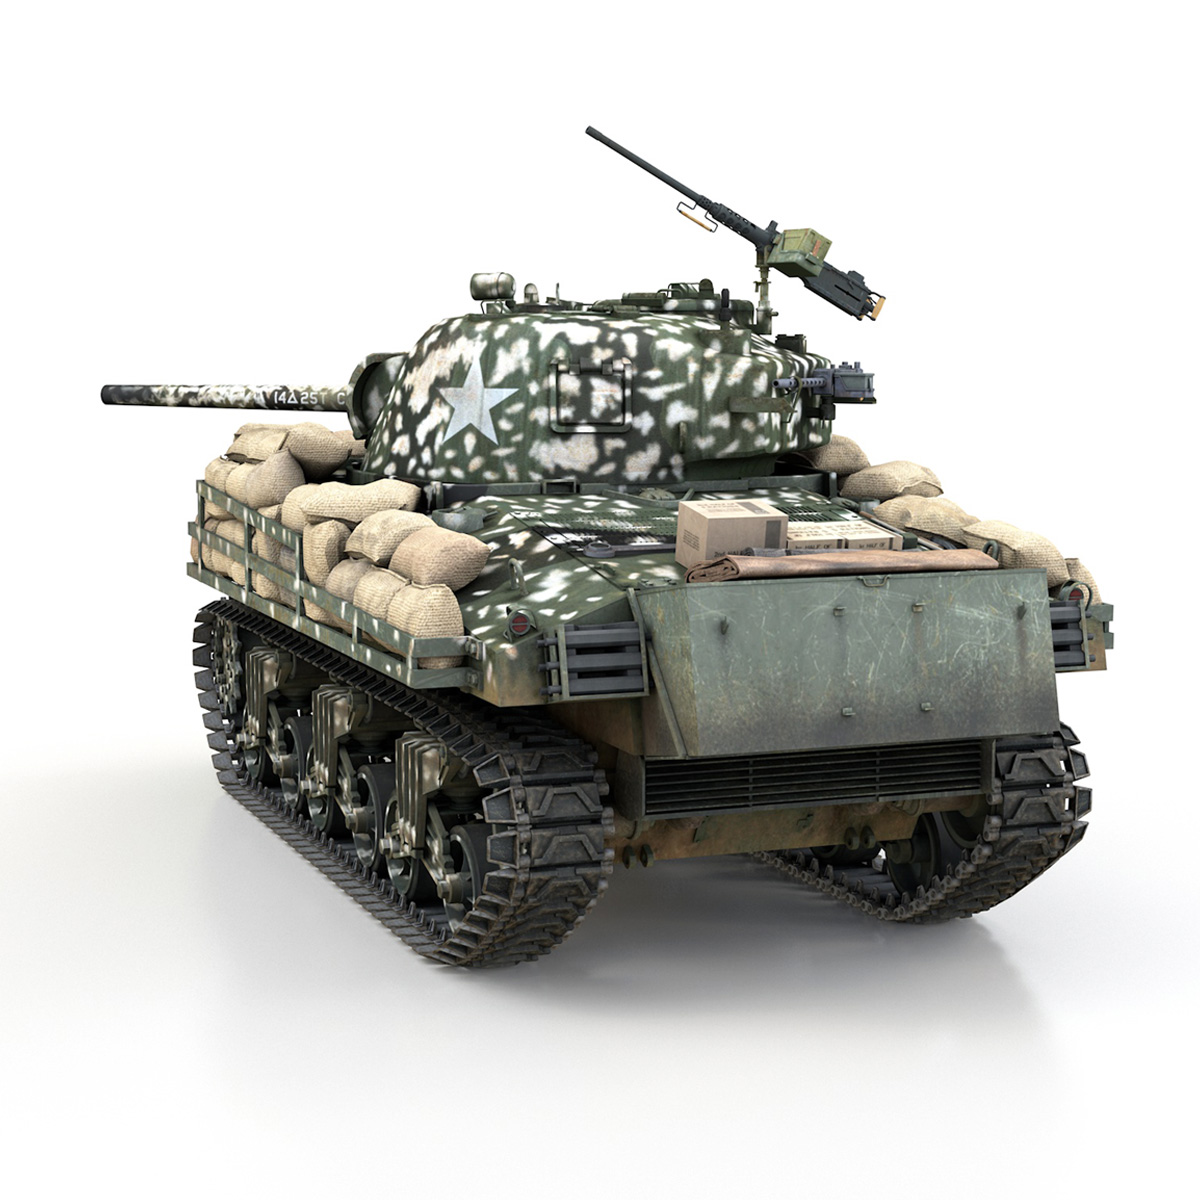 M4A3 (75) W Sherman - 25TB 3d model 3ds fbx c4d lwo lws lw obj 270679